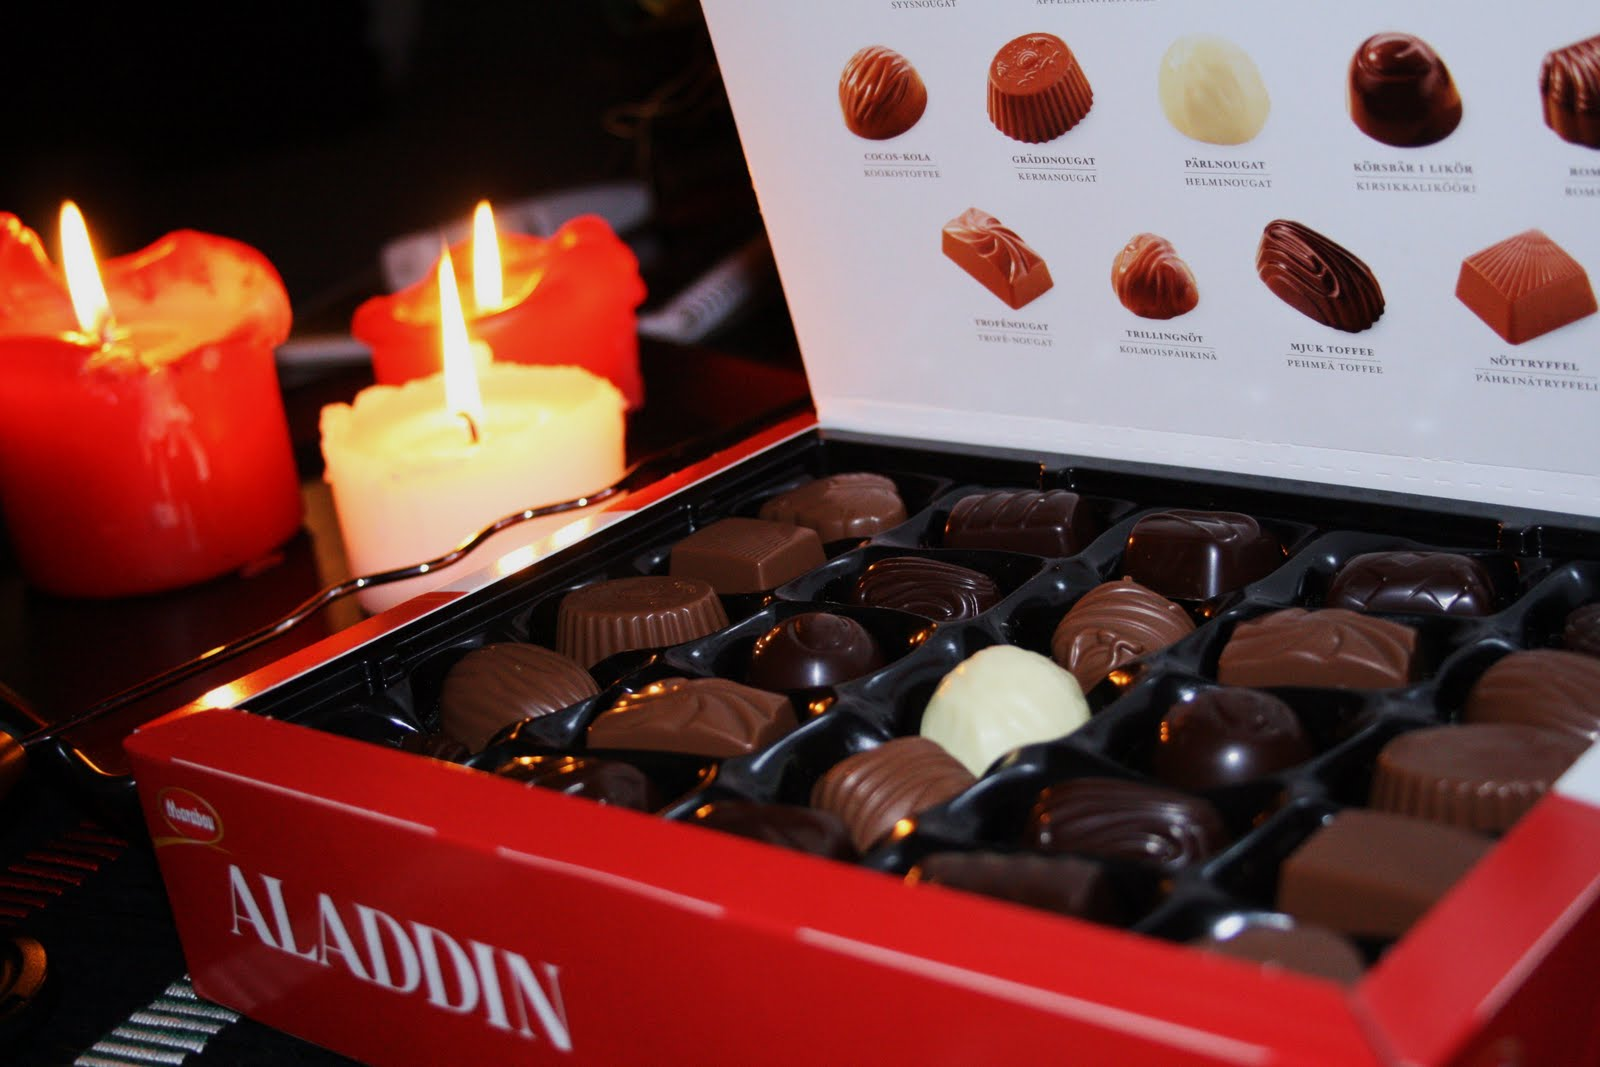 aladdin choklad sorter